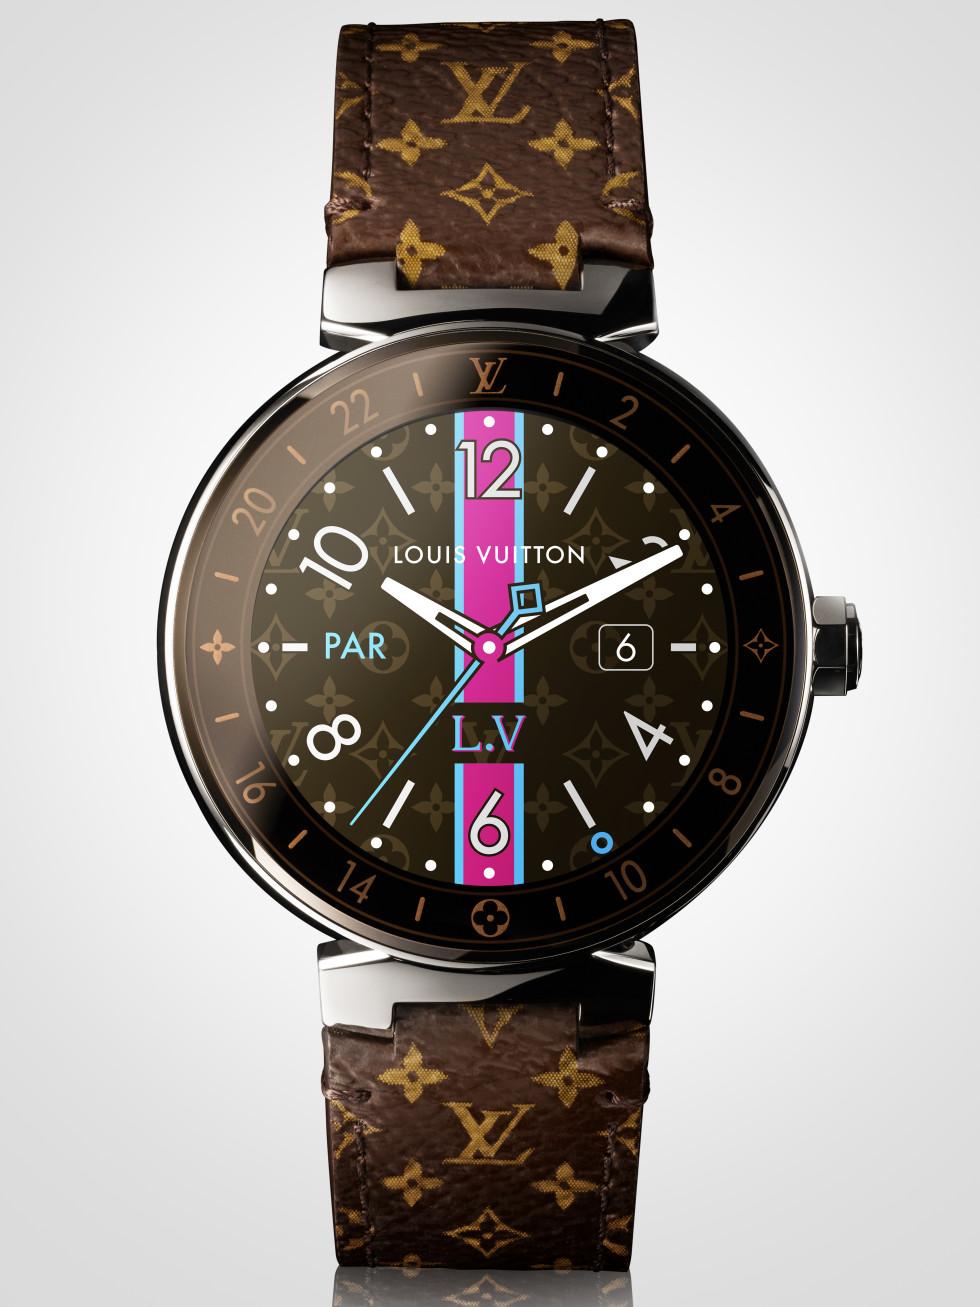 Houston, Louis Vuitton new Tambour Horizon watch, July 2017, Tambour Horizon Monogram Watch